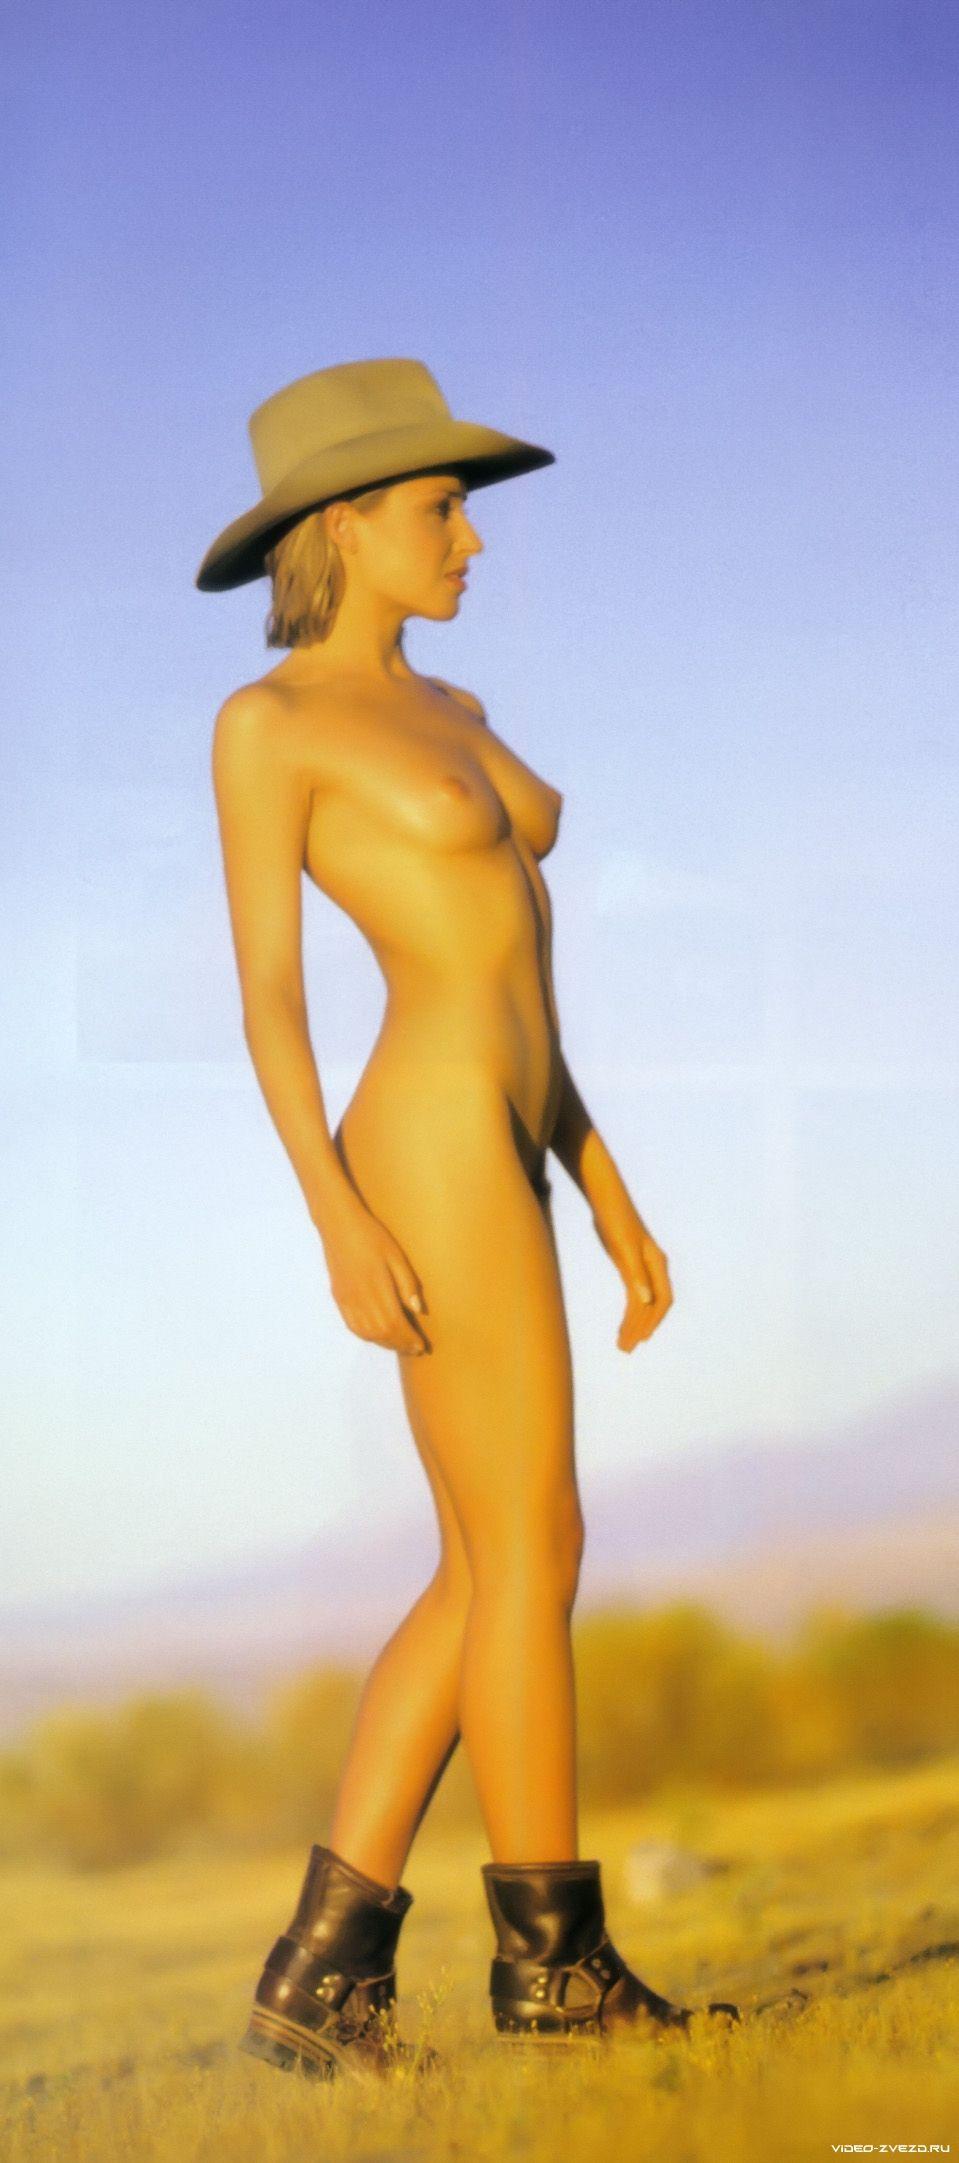 With dani minoge nude properties turns